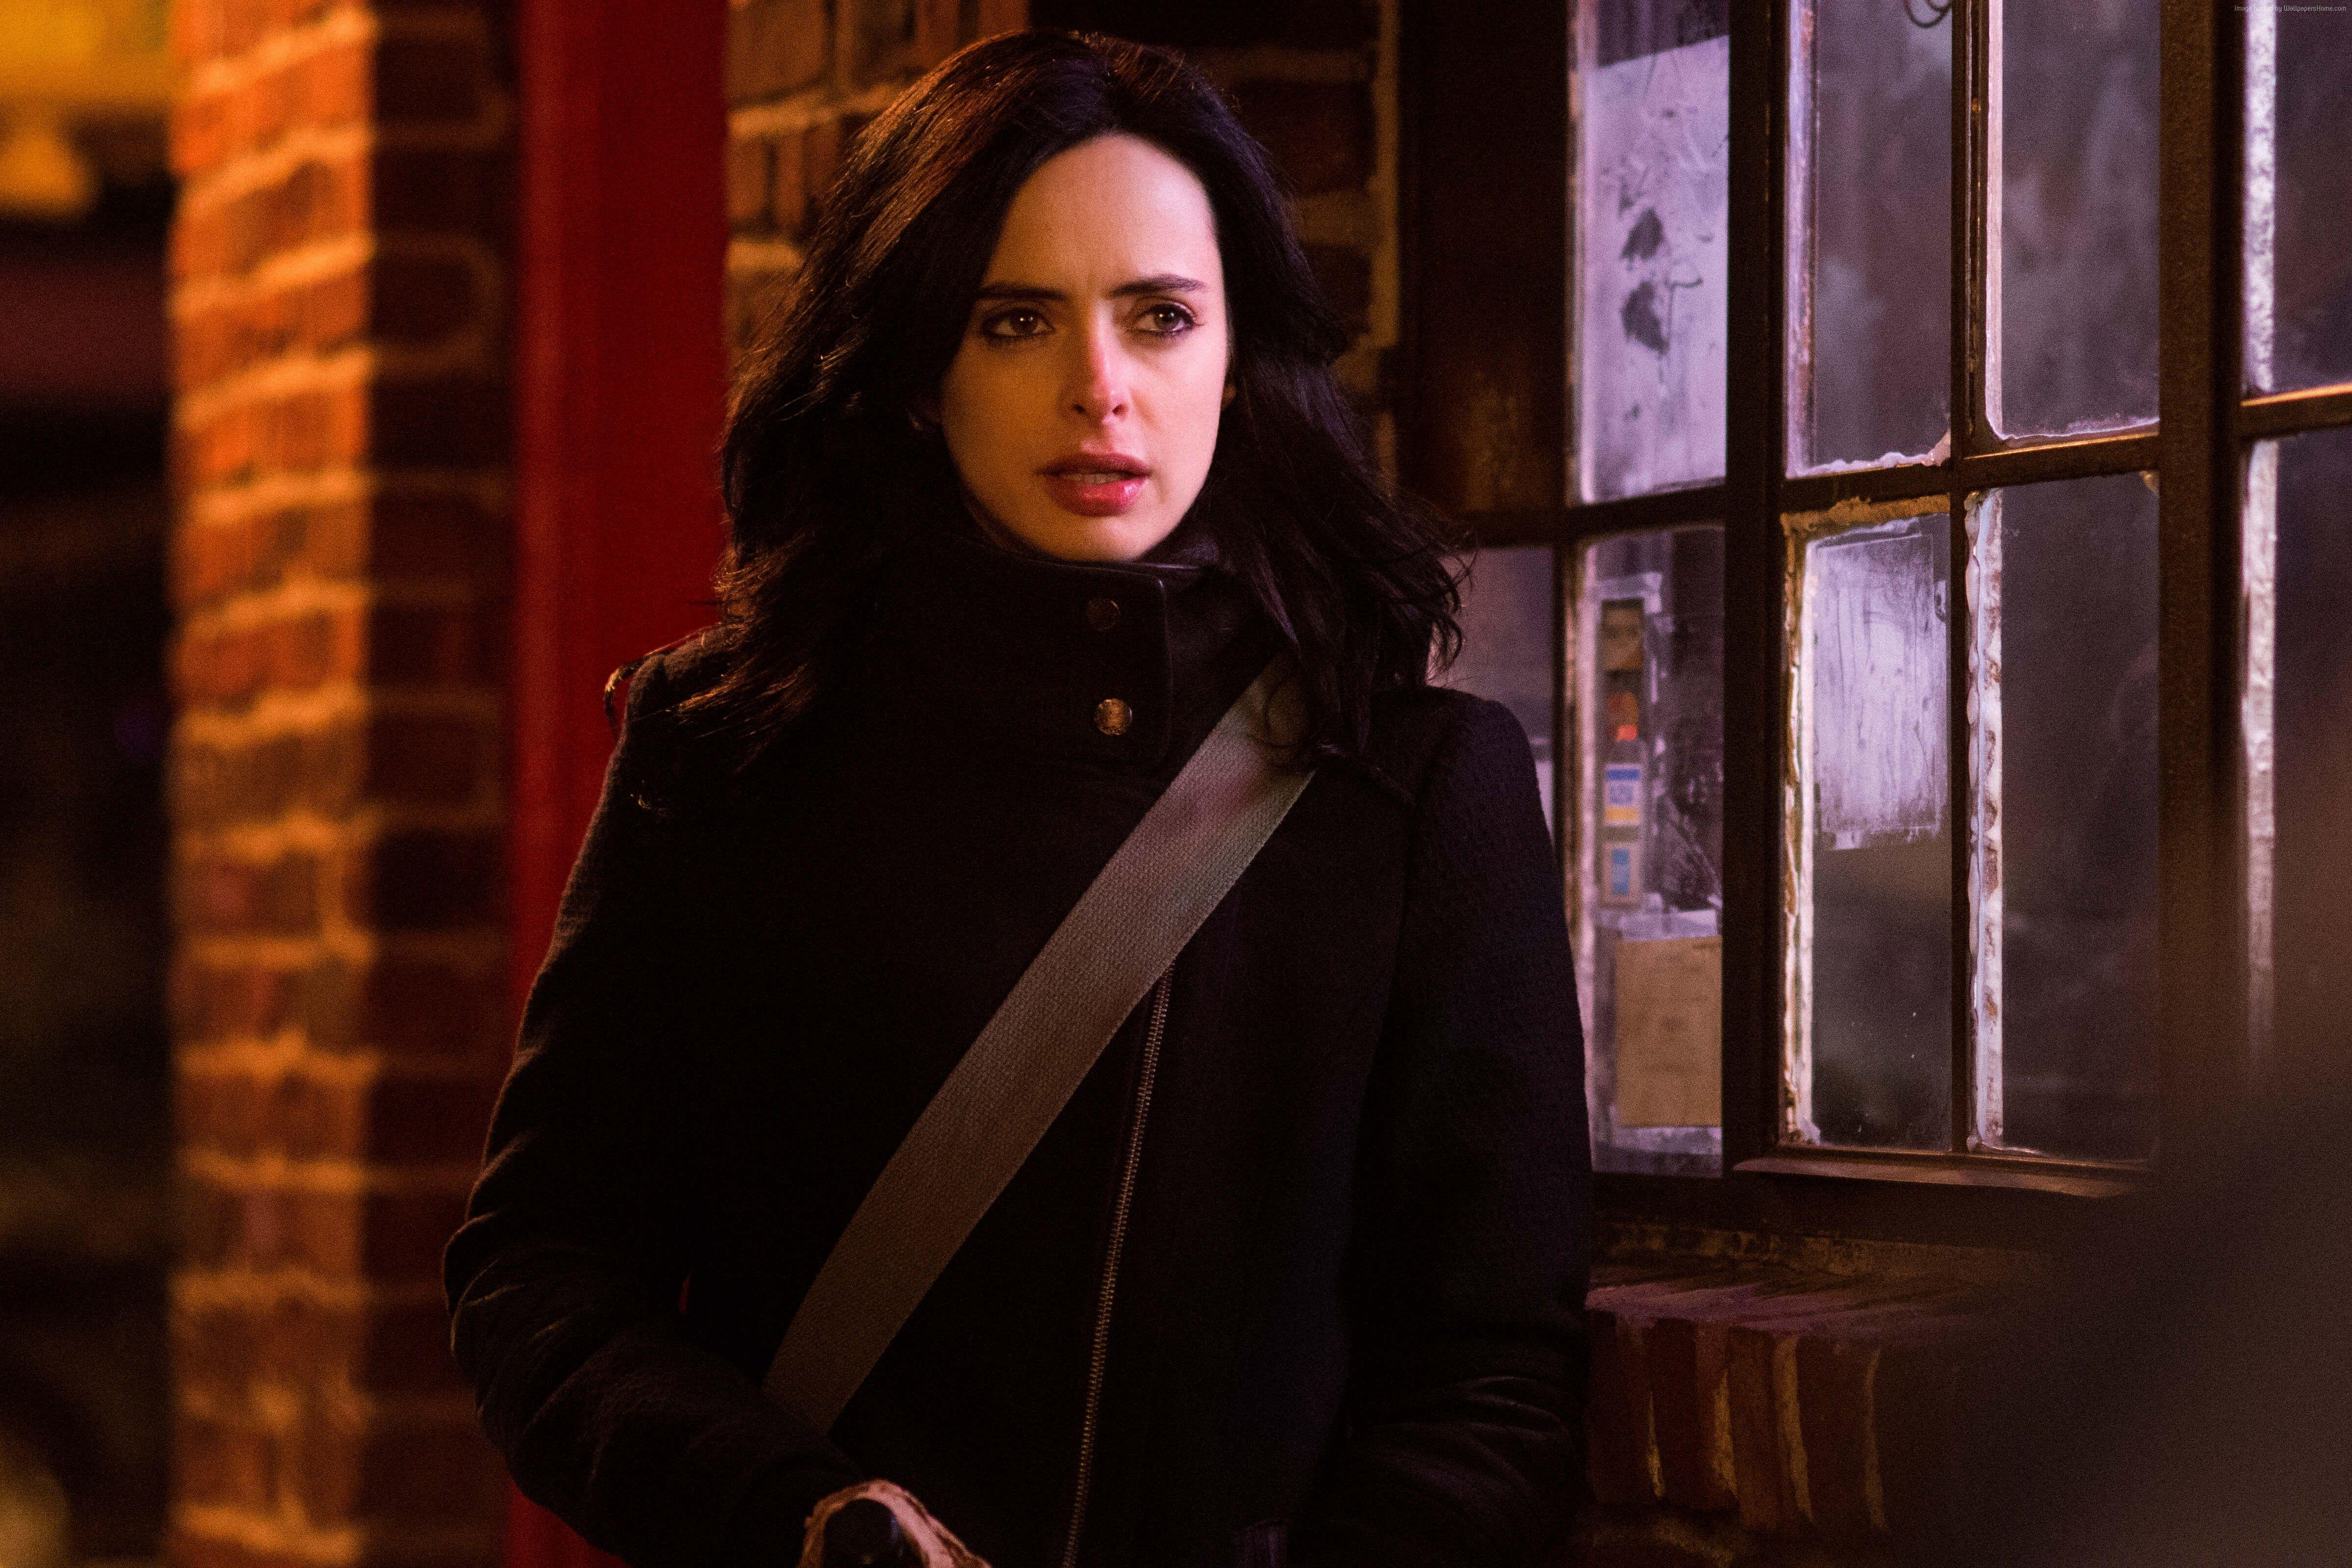 Jessica Jones Wallpaper, Movies: Jessica Jones, Best TV series ...